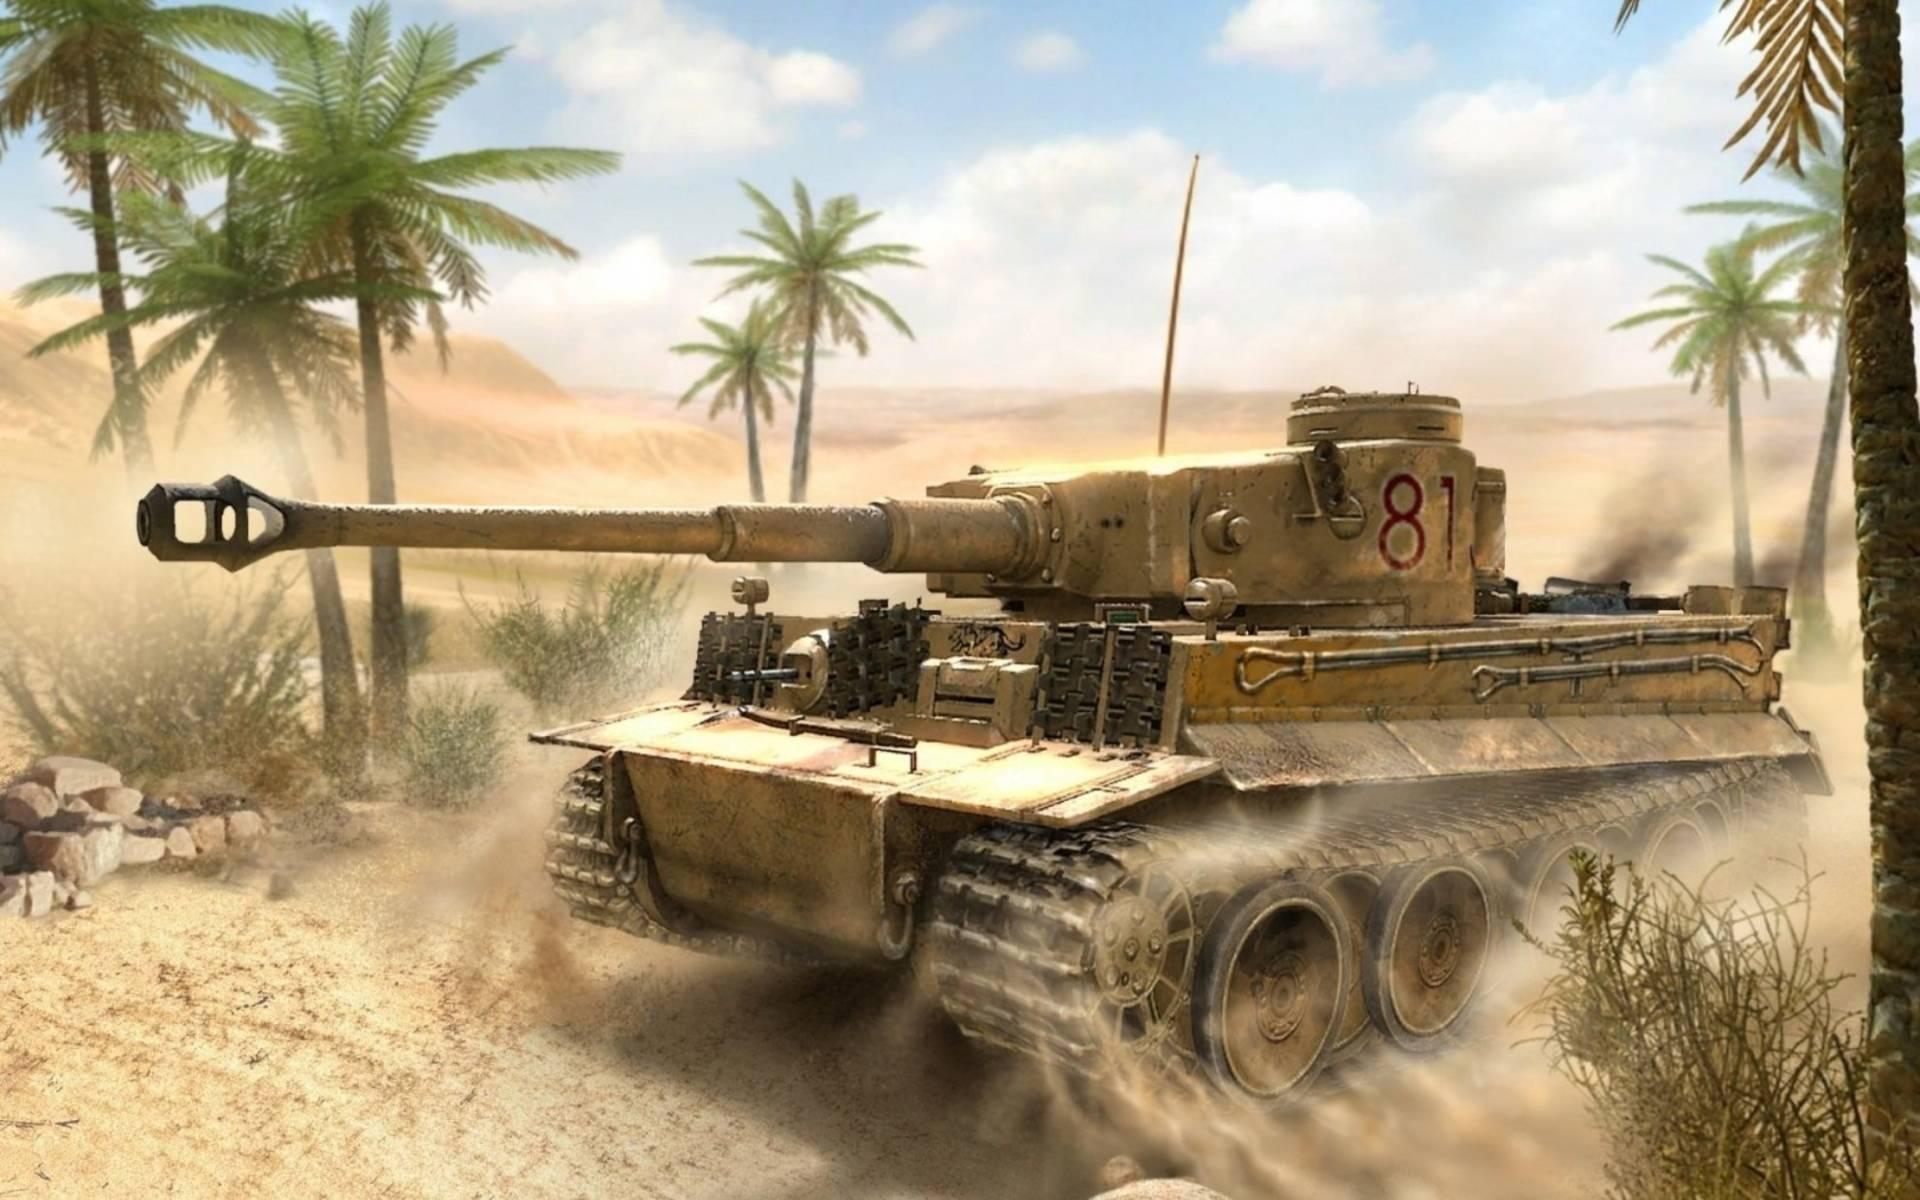 обои танк Тигр, пески, пальмы, world of tanks картинки фото